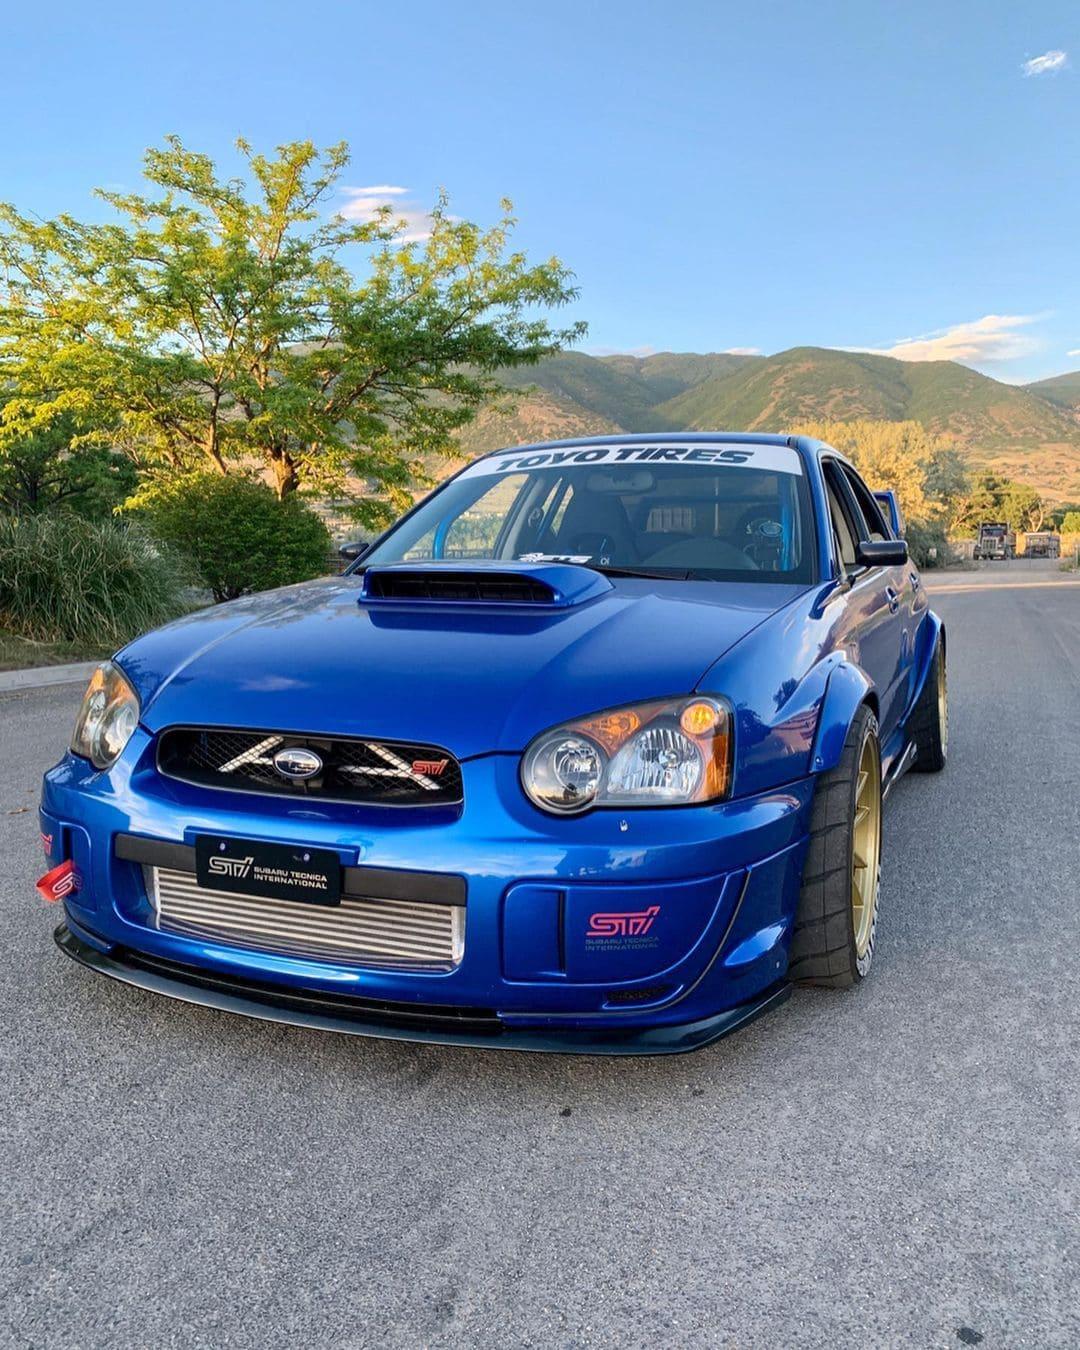 Subaru STI Front End